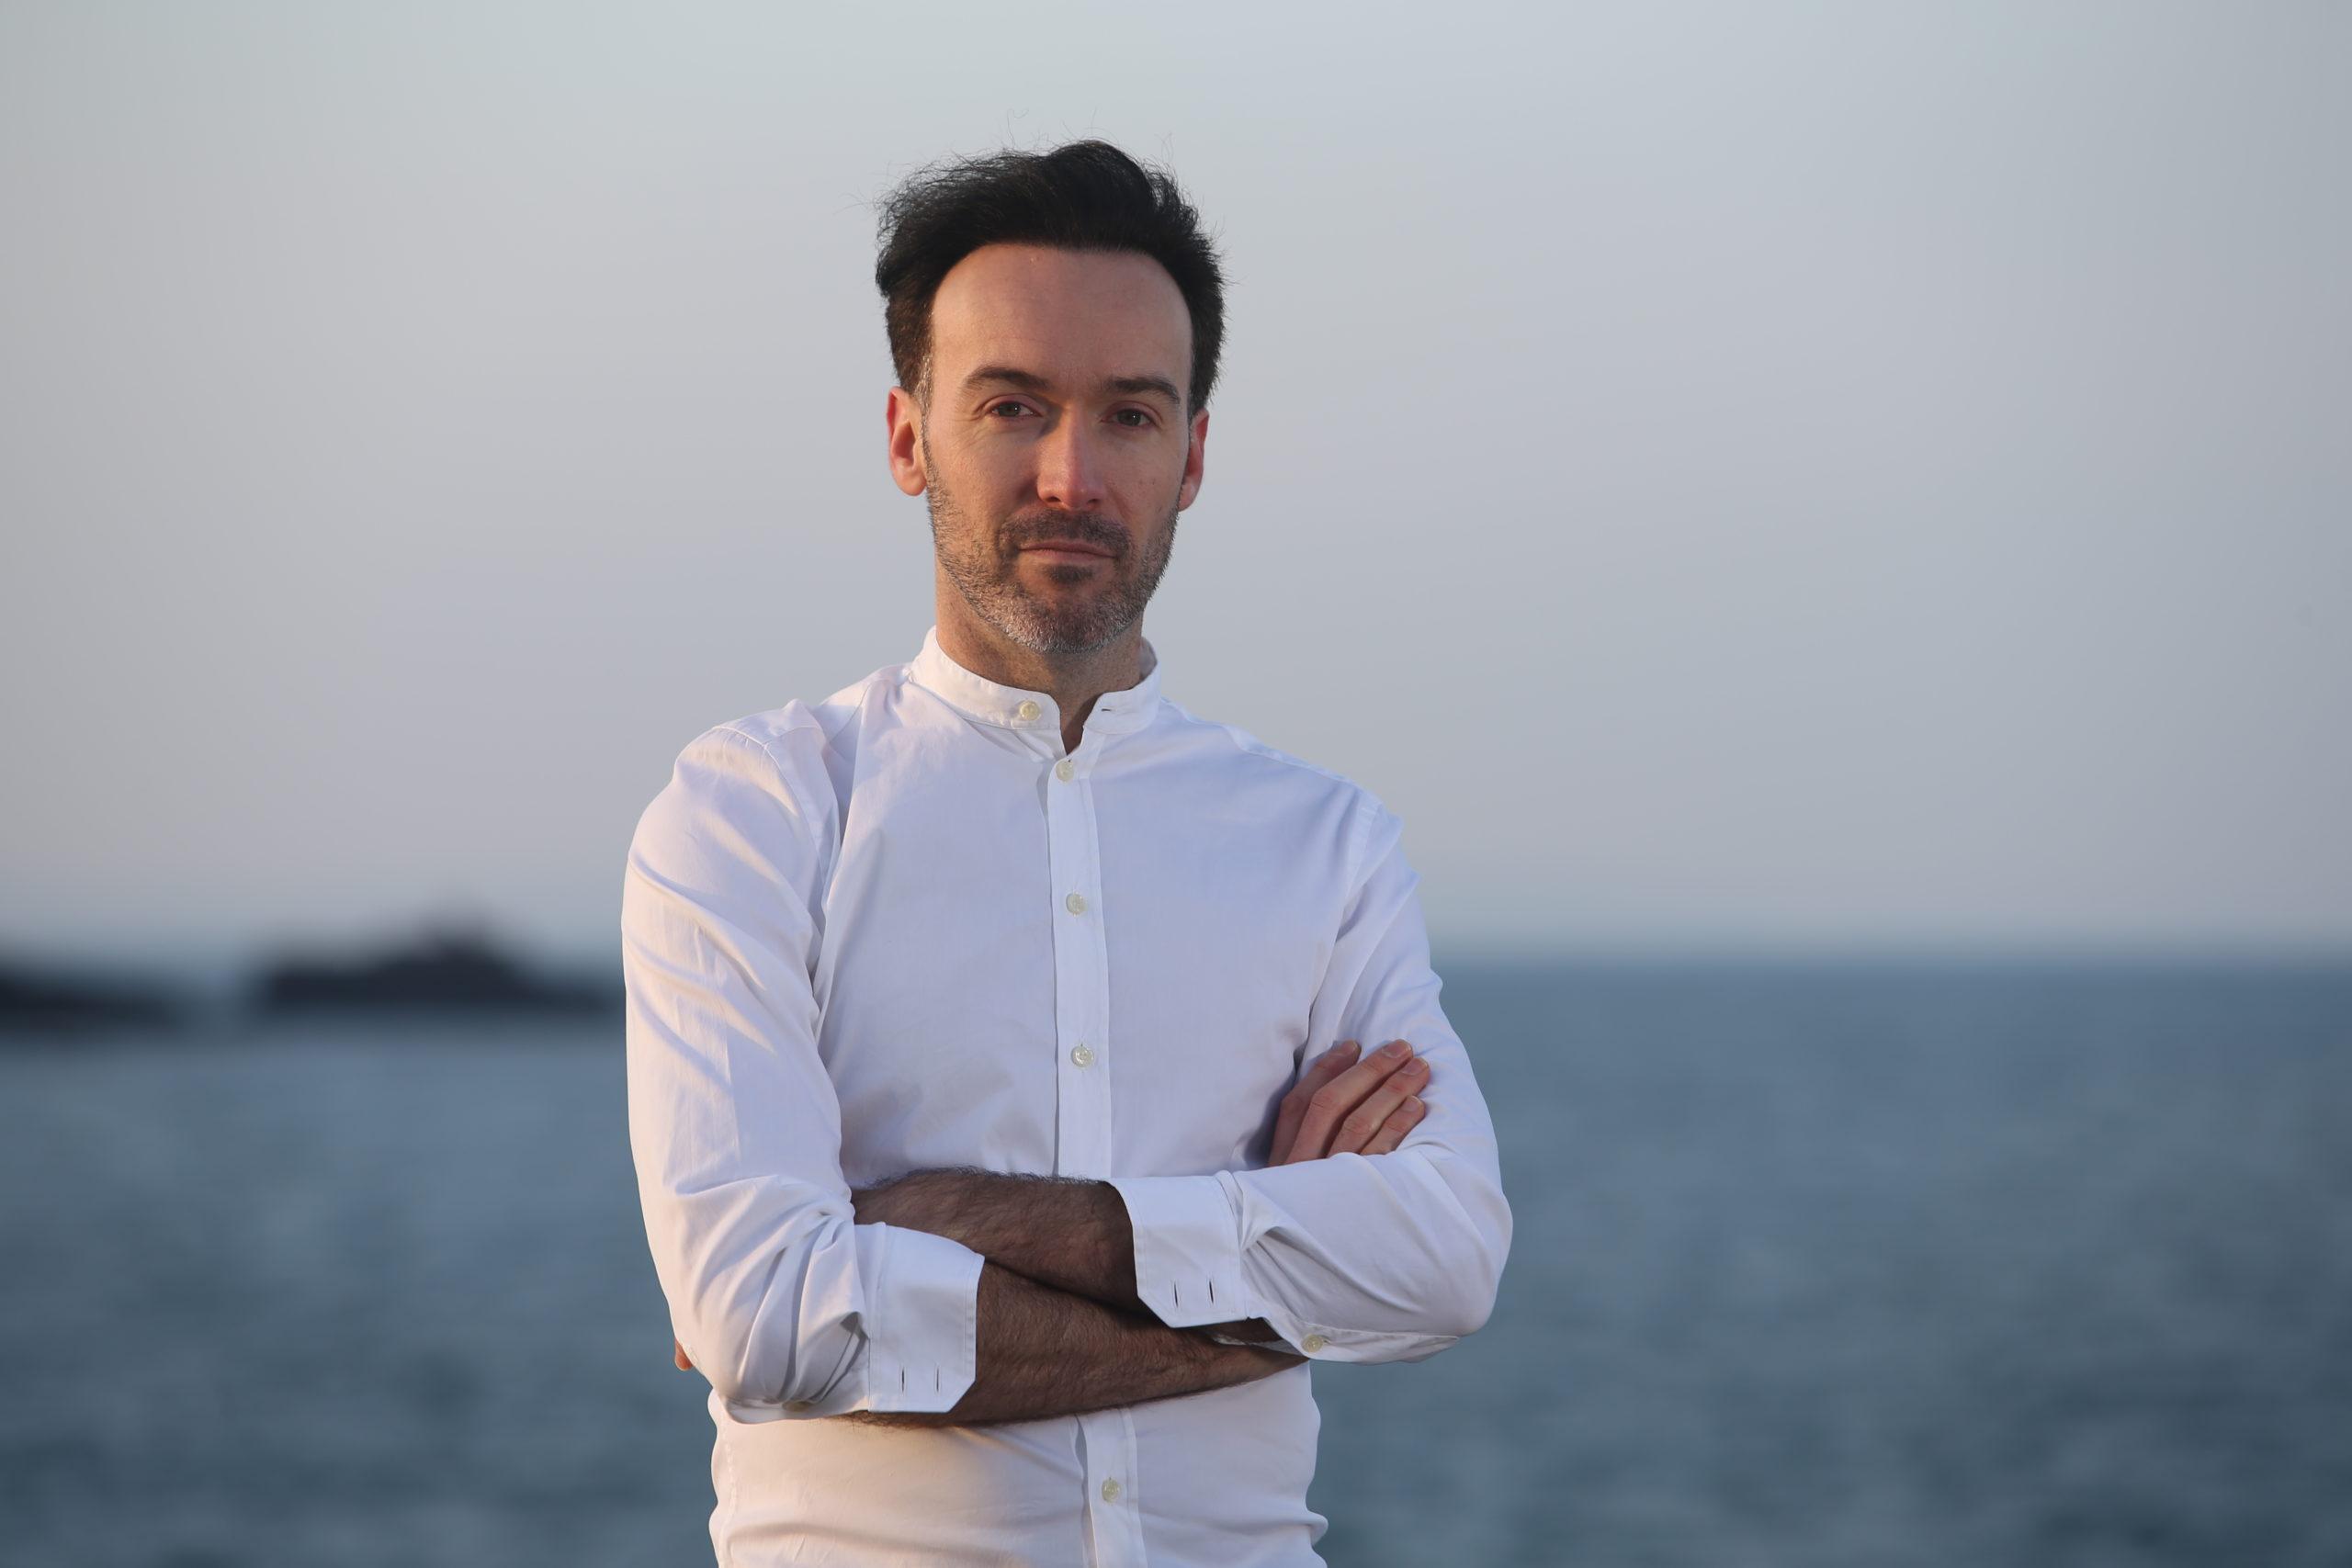 Yoann Barbereau